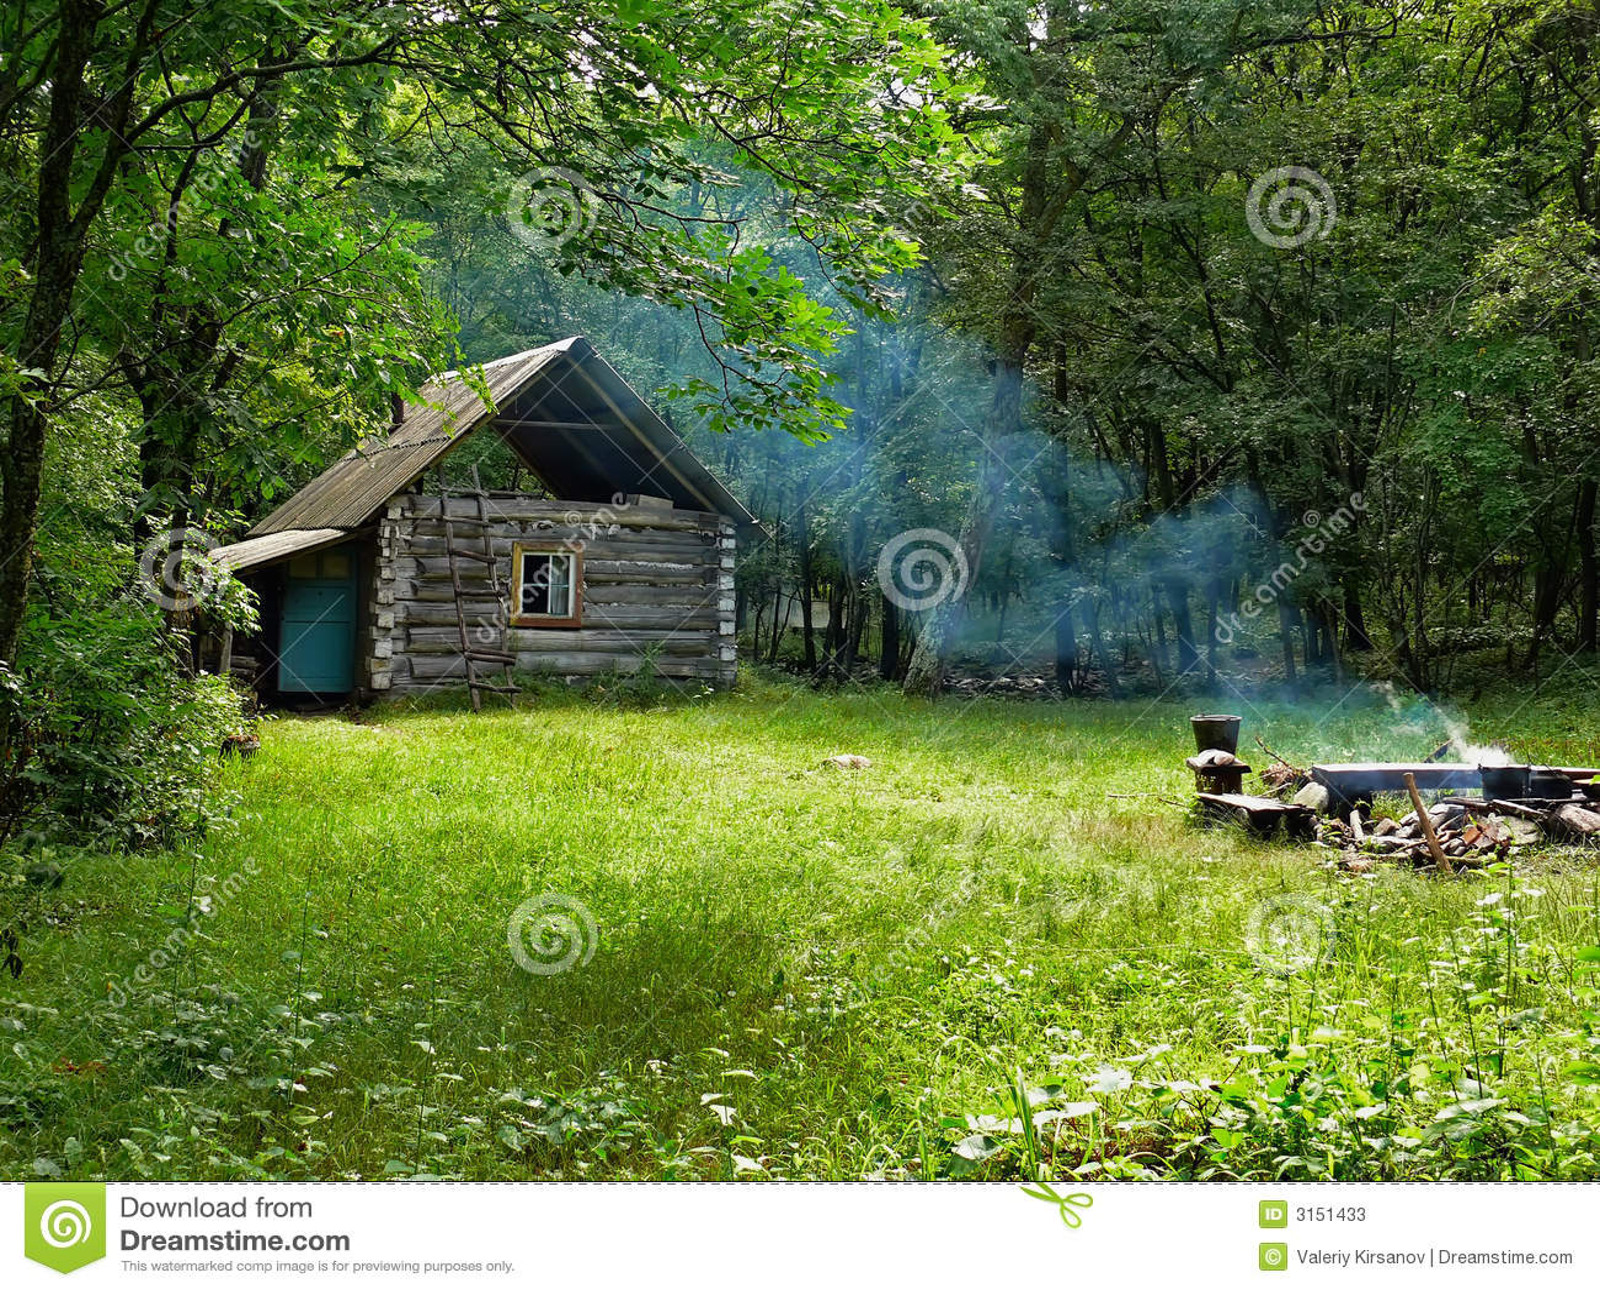 Kabine in Wald 3